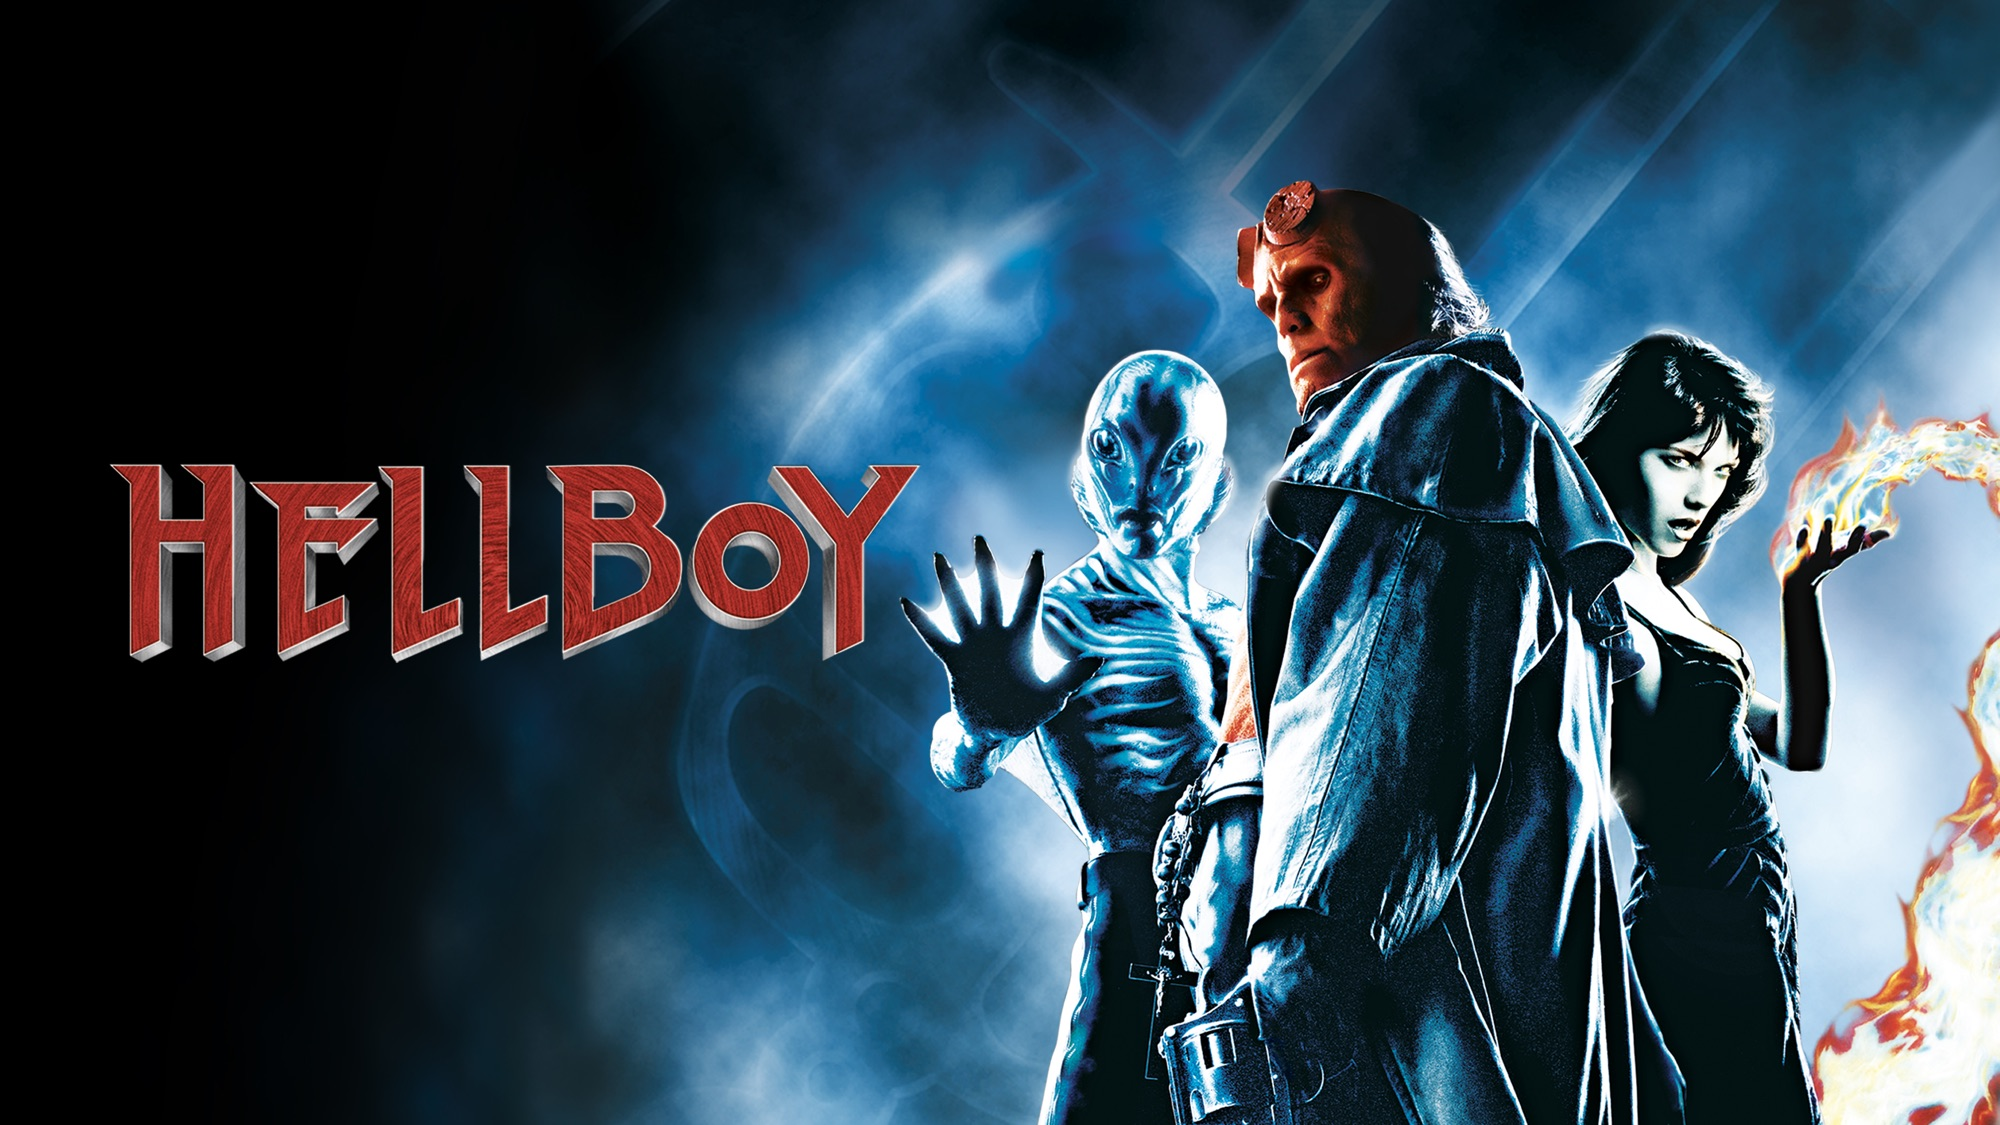 Hellboy (2004) HD Wallpaper   Background Image   2000x1125